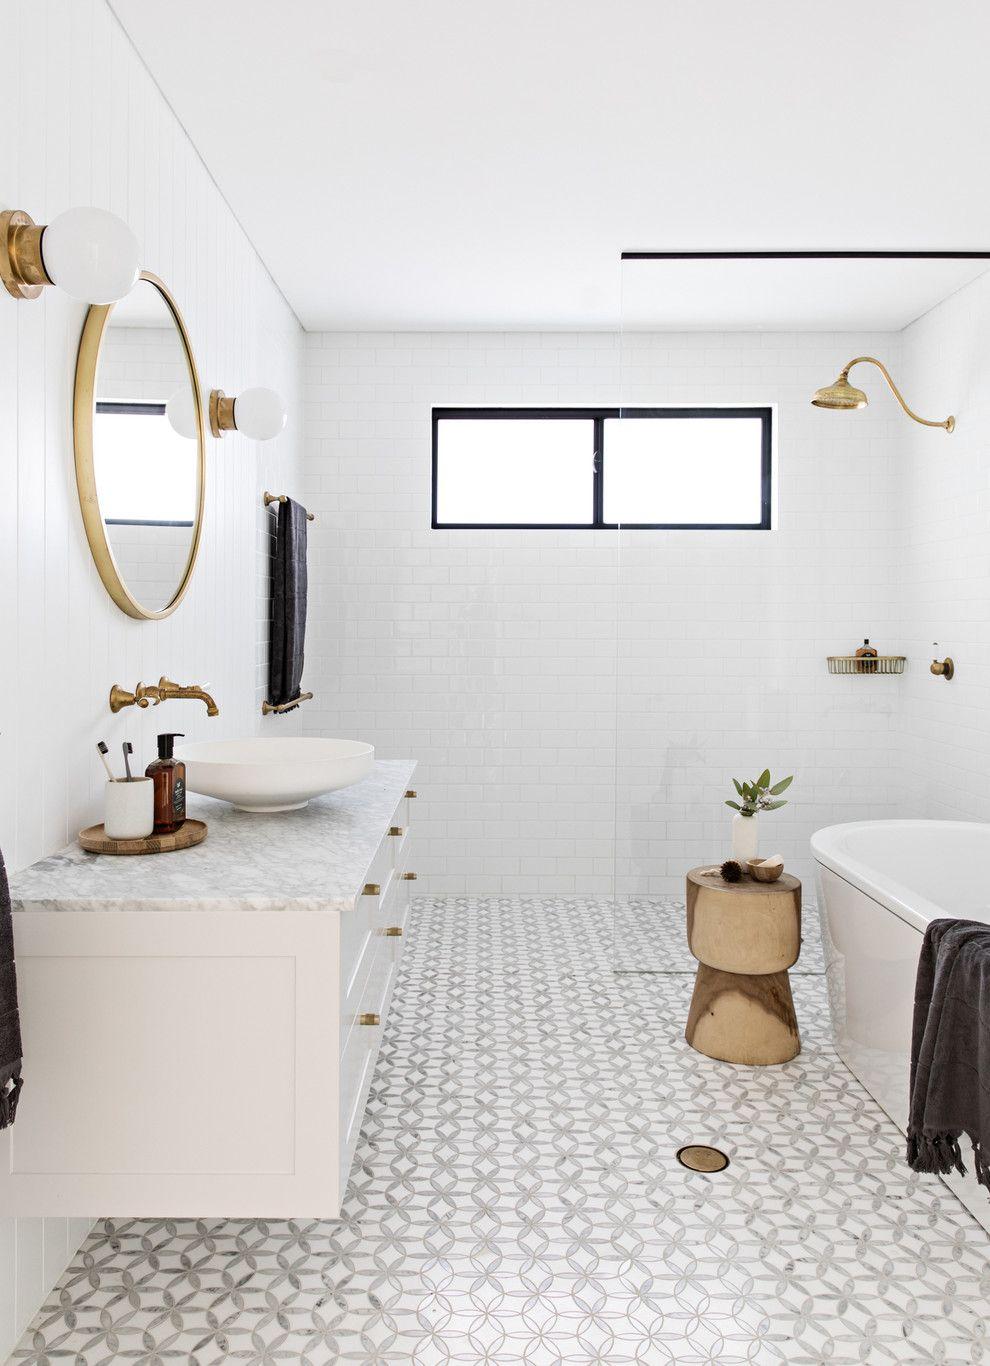 16 Beautiful Scandinavian Bathroom Designs You Re Gonna Love Scandinavian Bathroom Scandinavian Bathroom Design Bathroom Design Bathroom redecorating ideas png